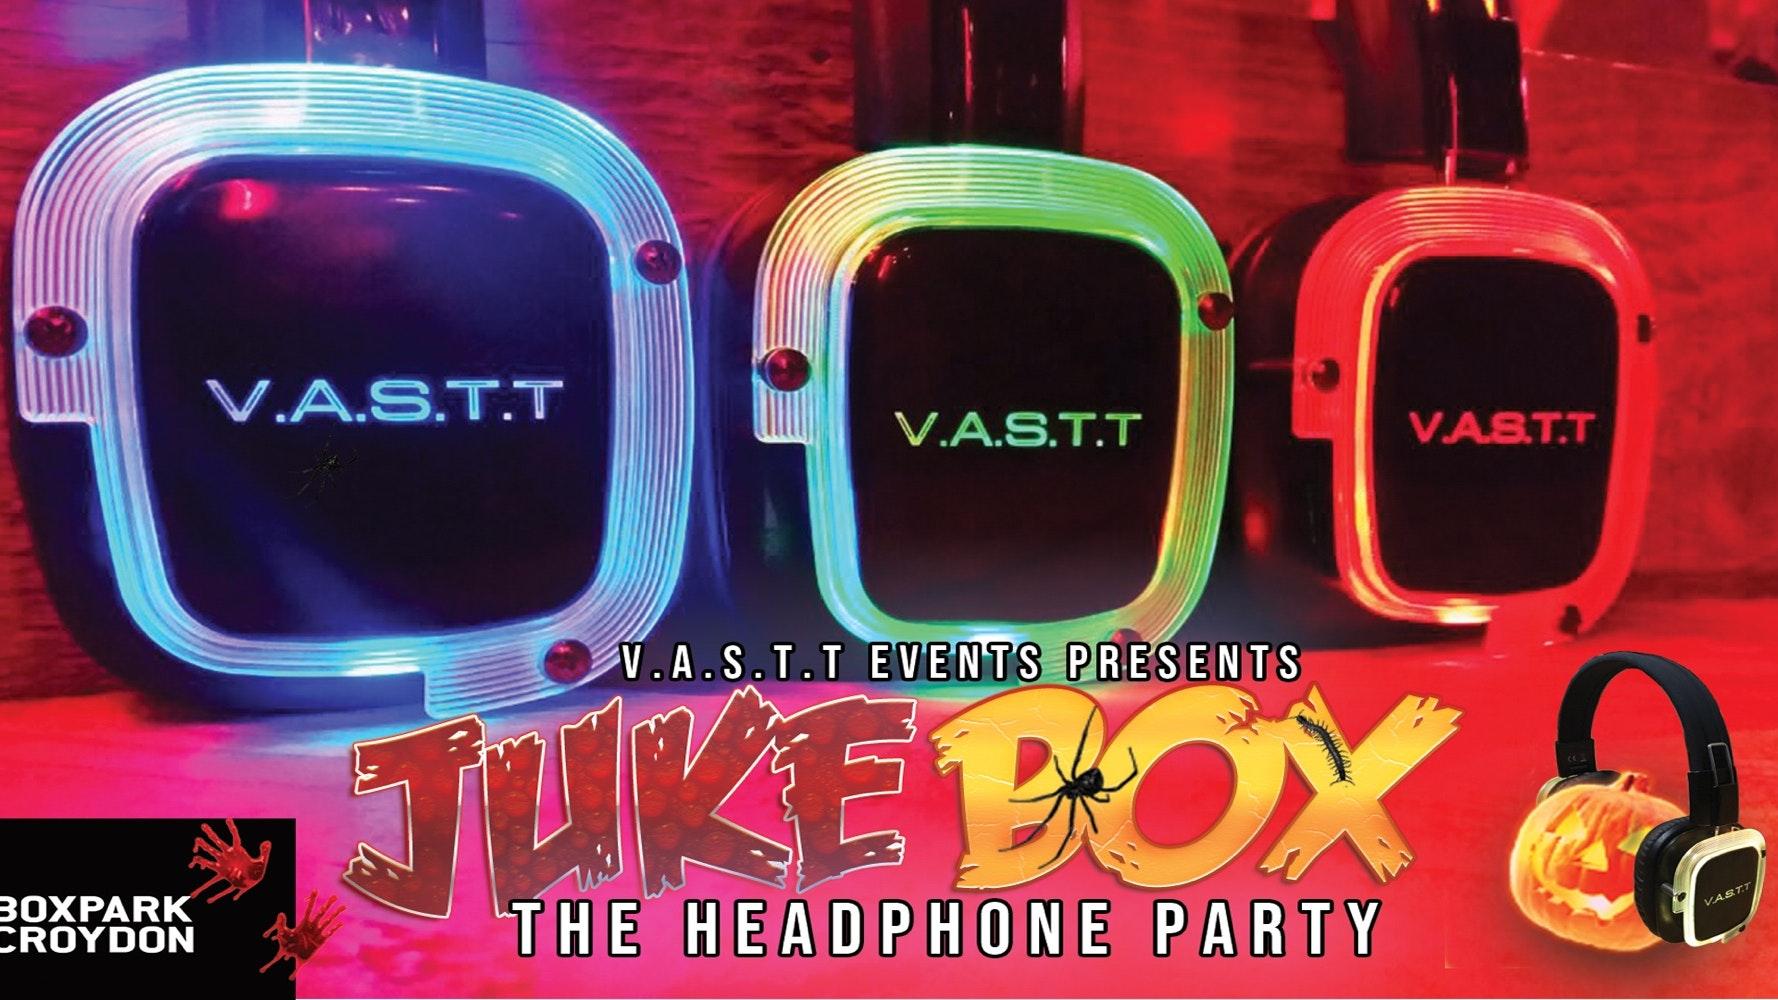 HALLOWEEN Headphone party @BOXPARK CROYDON